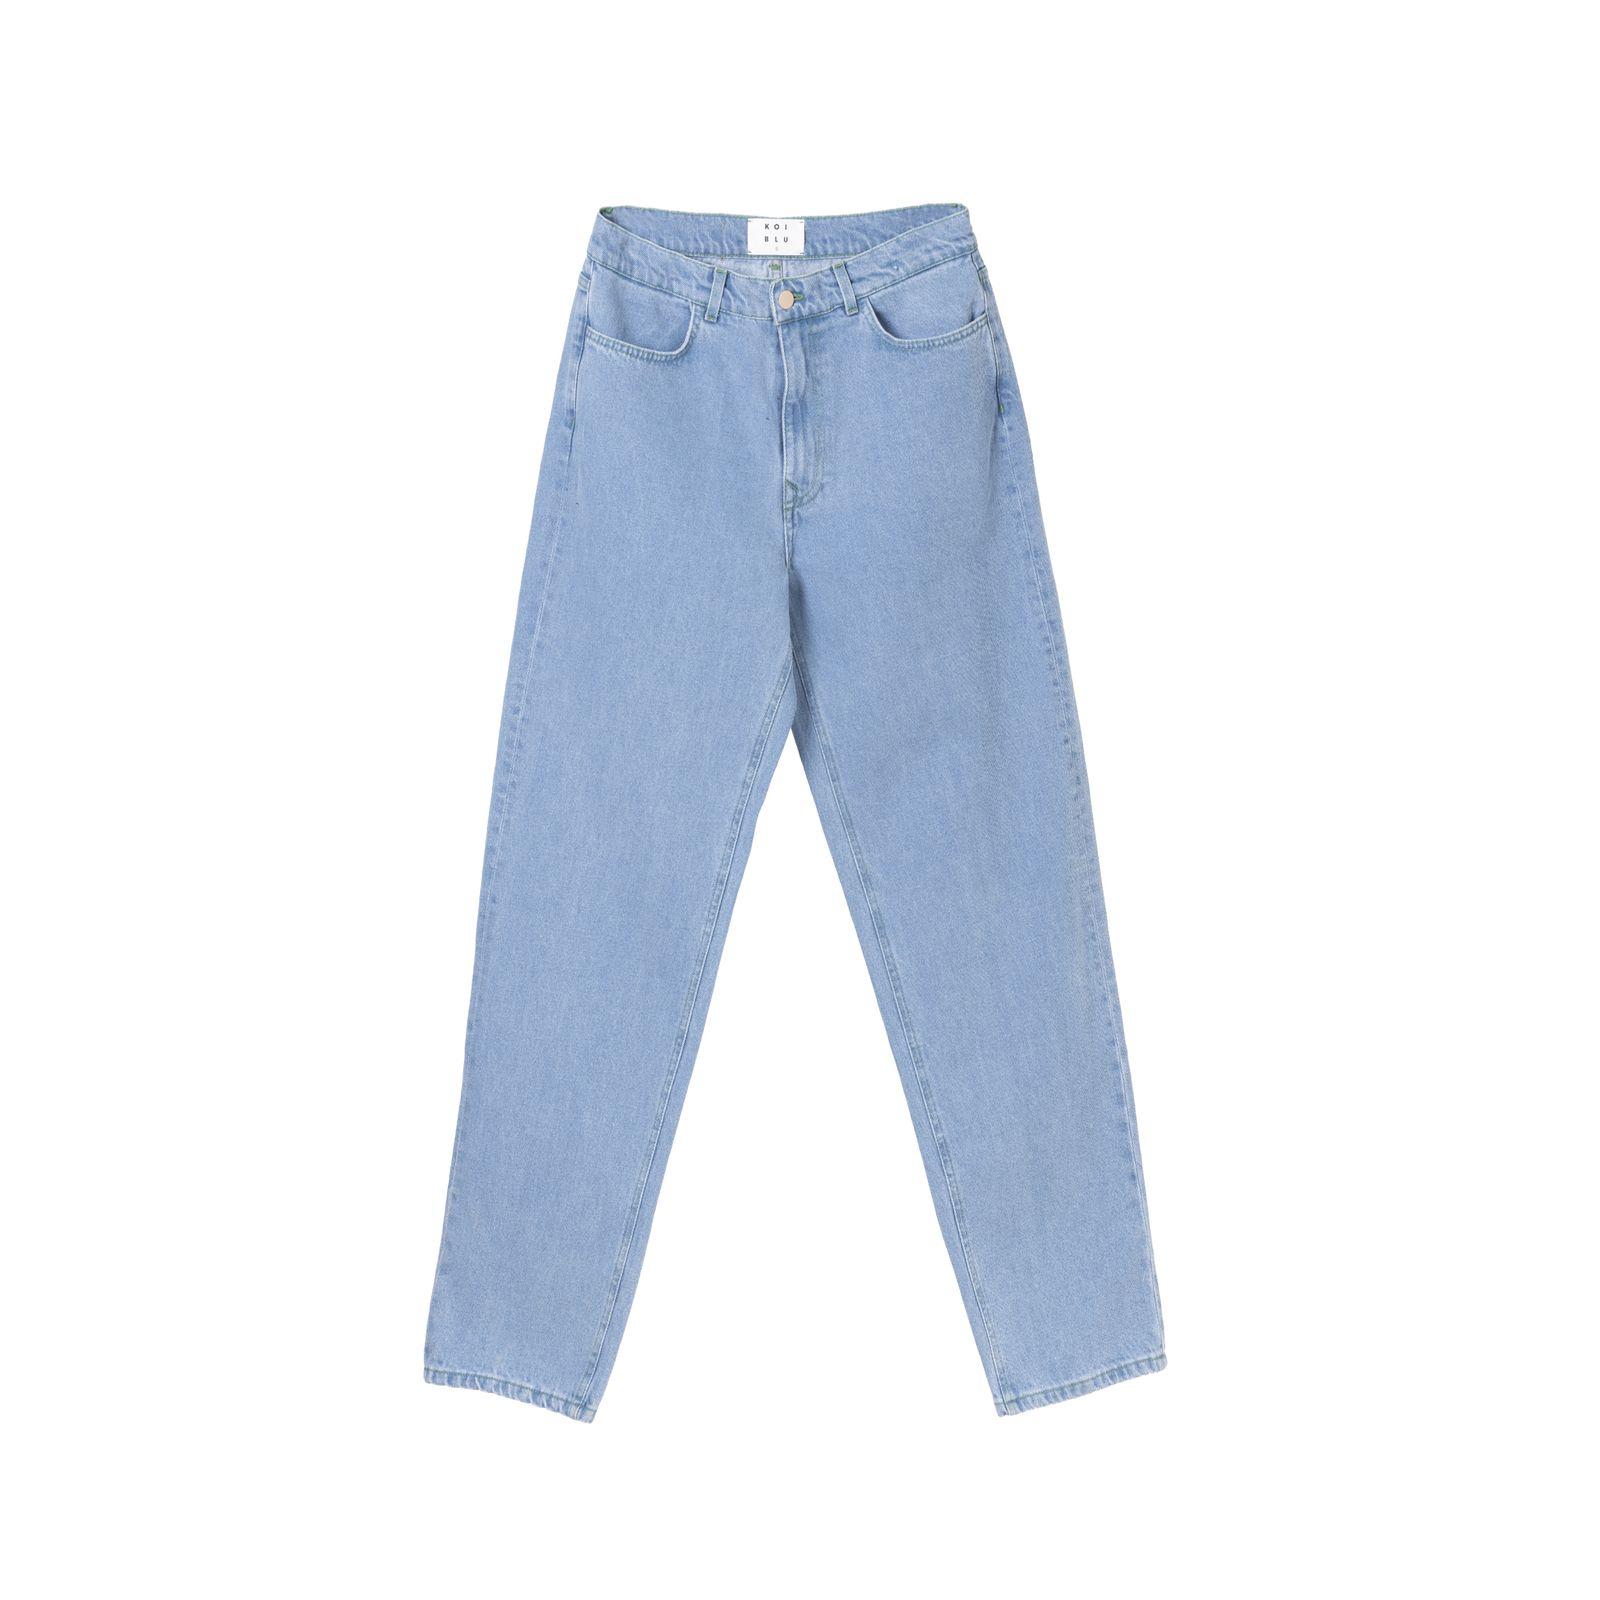 شلوار جین مردانه کوی مدل دایی رنگ آبی روشن -  - 1